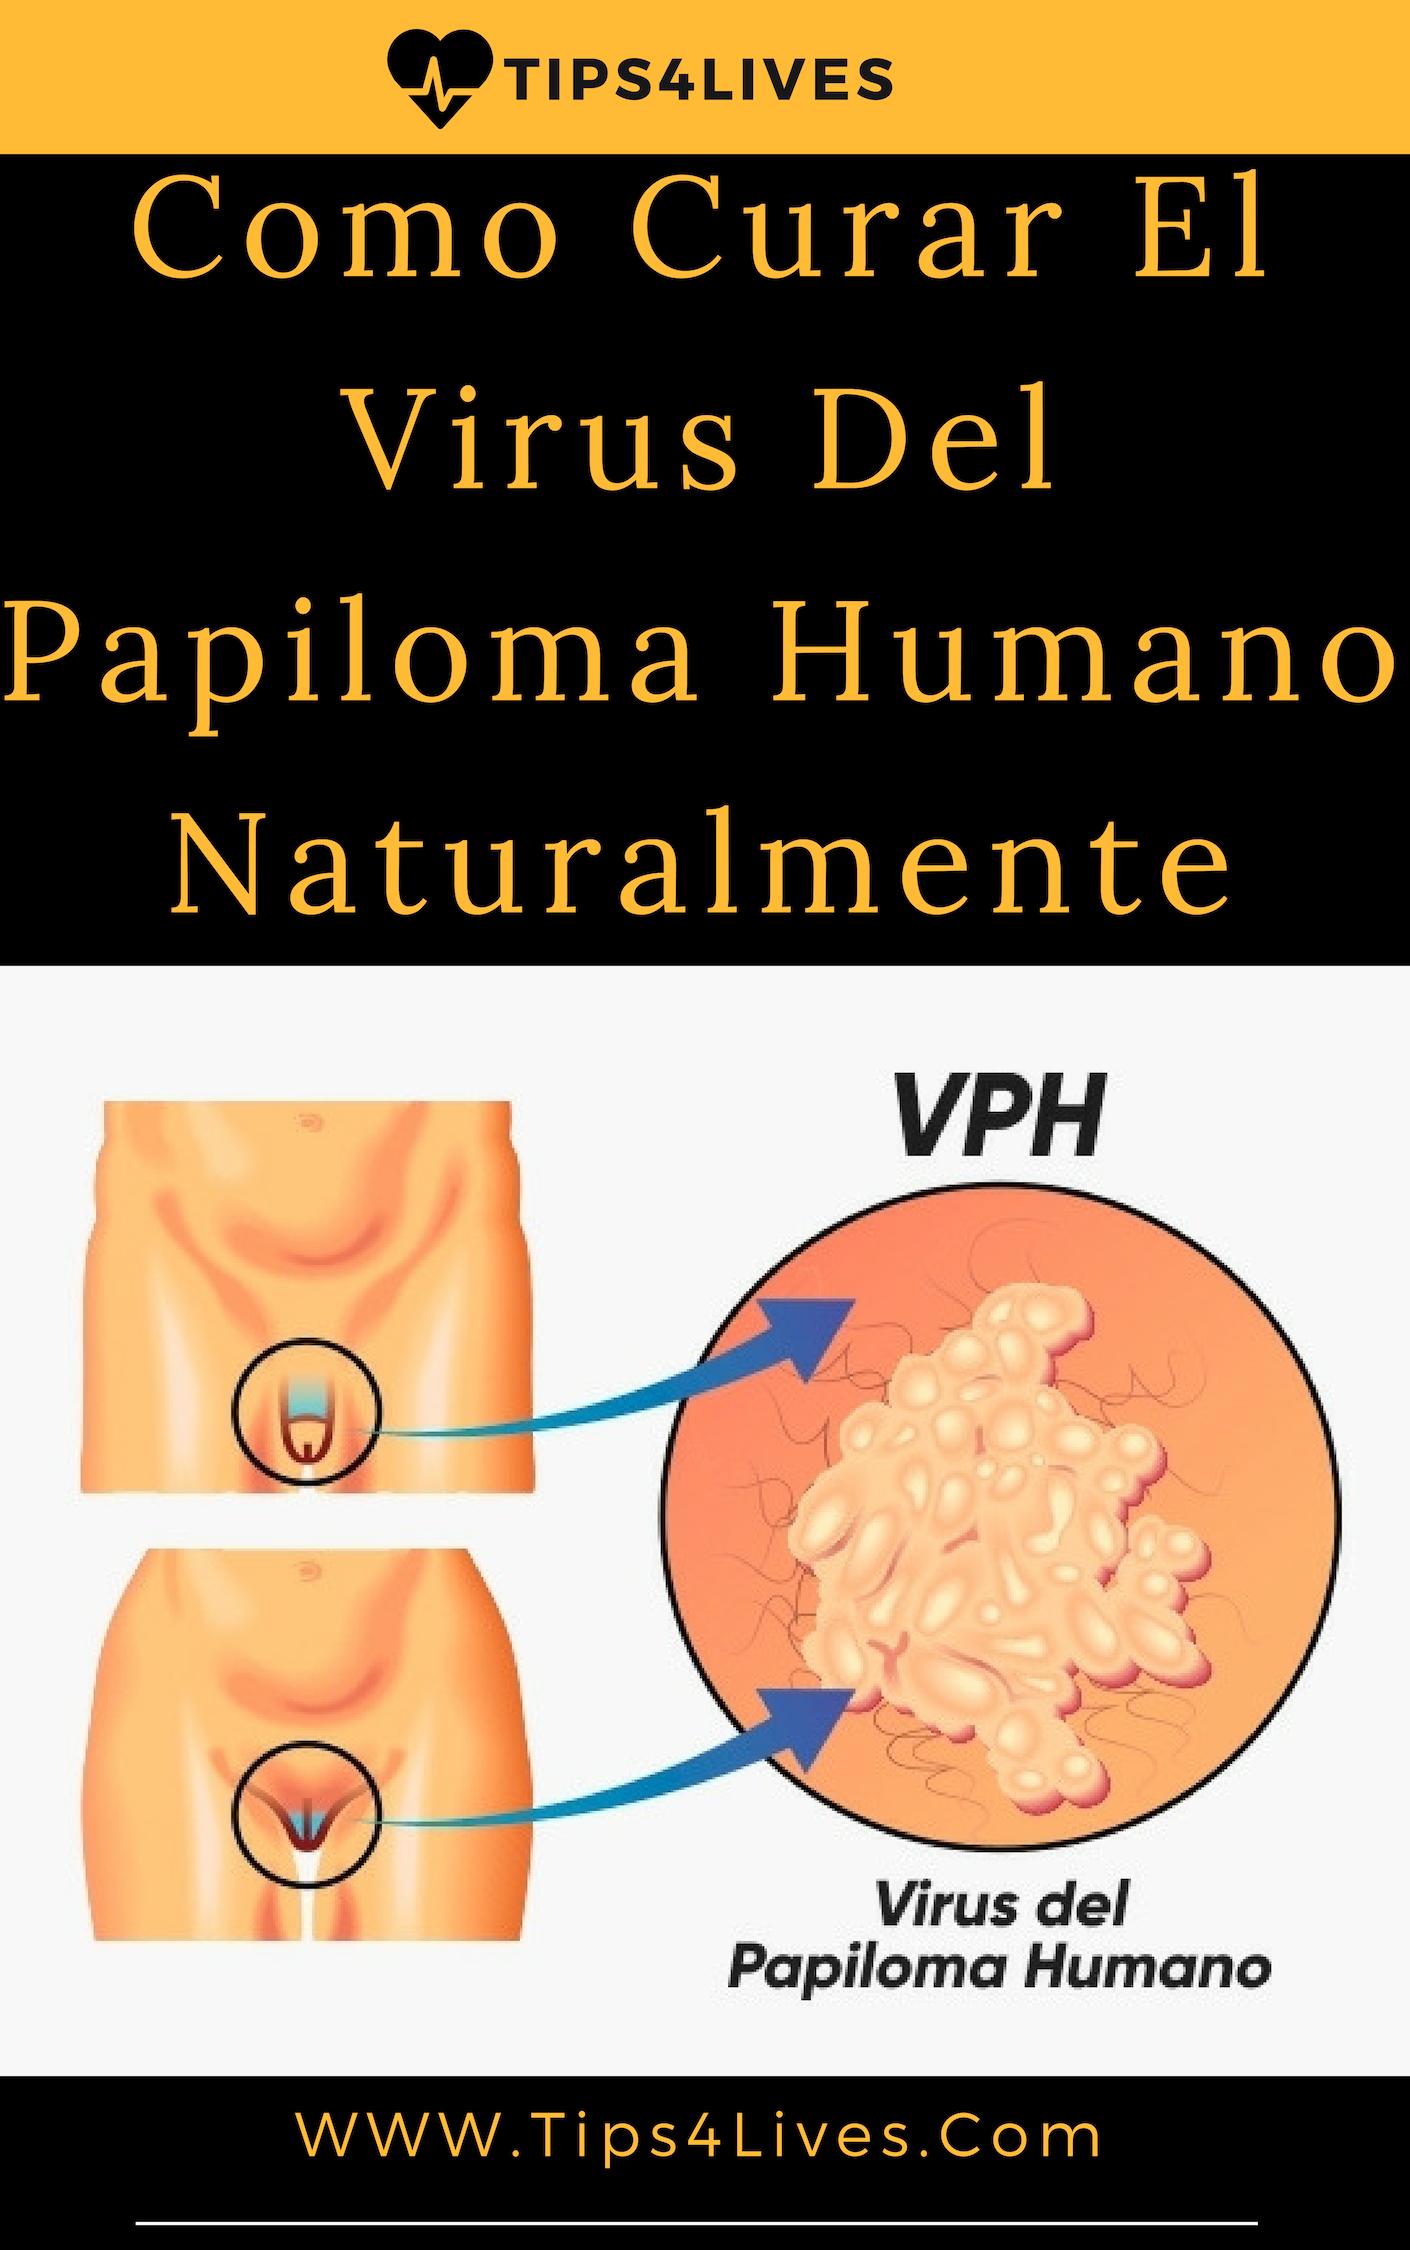 papiloma humano tratamiento en hombres gastric cancer umbilical nodule